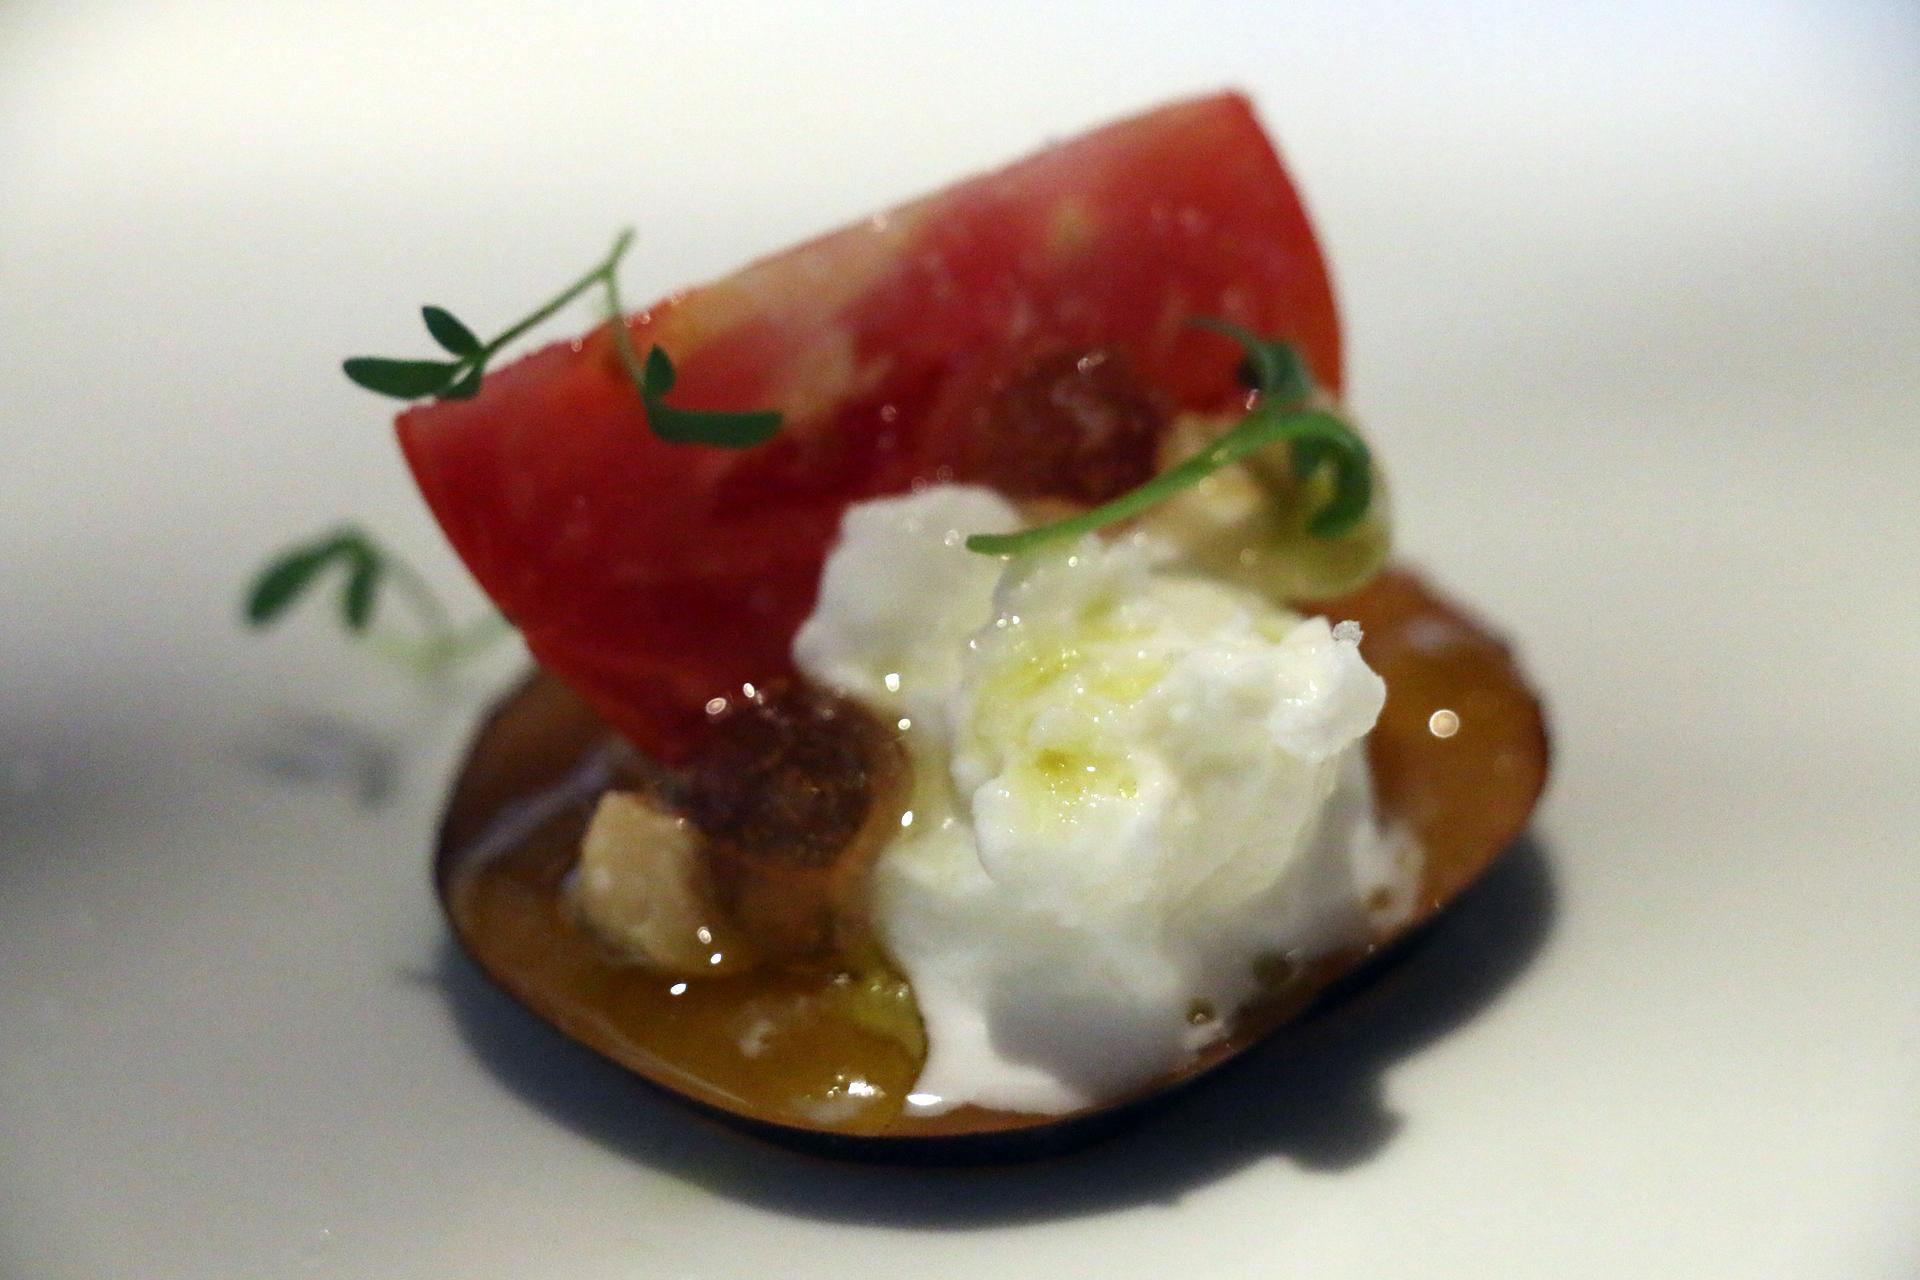 Plum, tomato and buffalo mozzarella salad